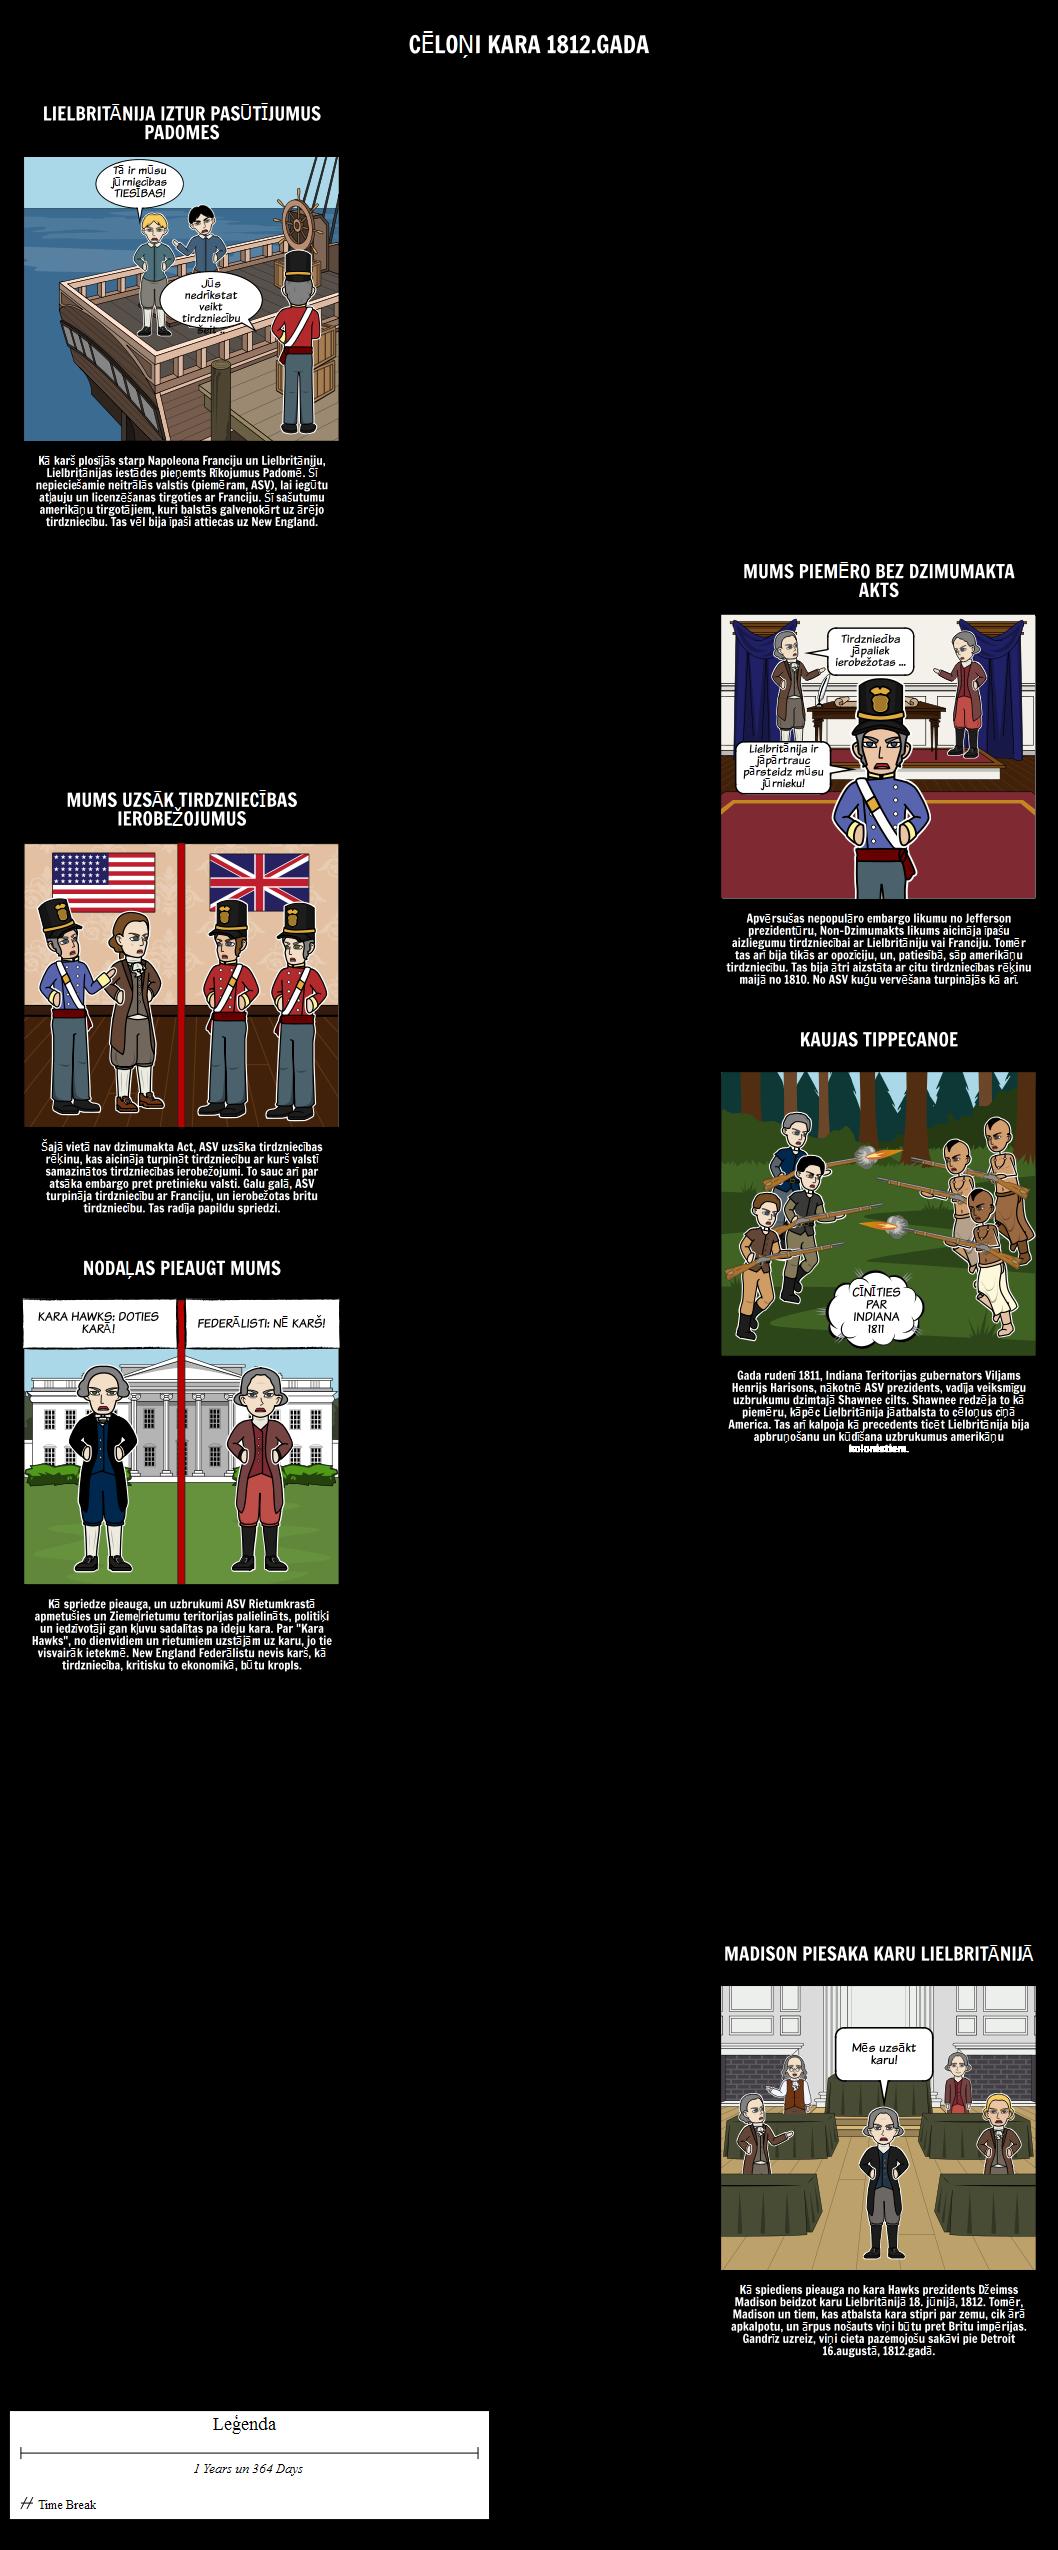 Kara 1812 - Cēloņi kara 1812 Timeline